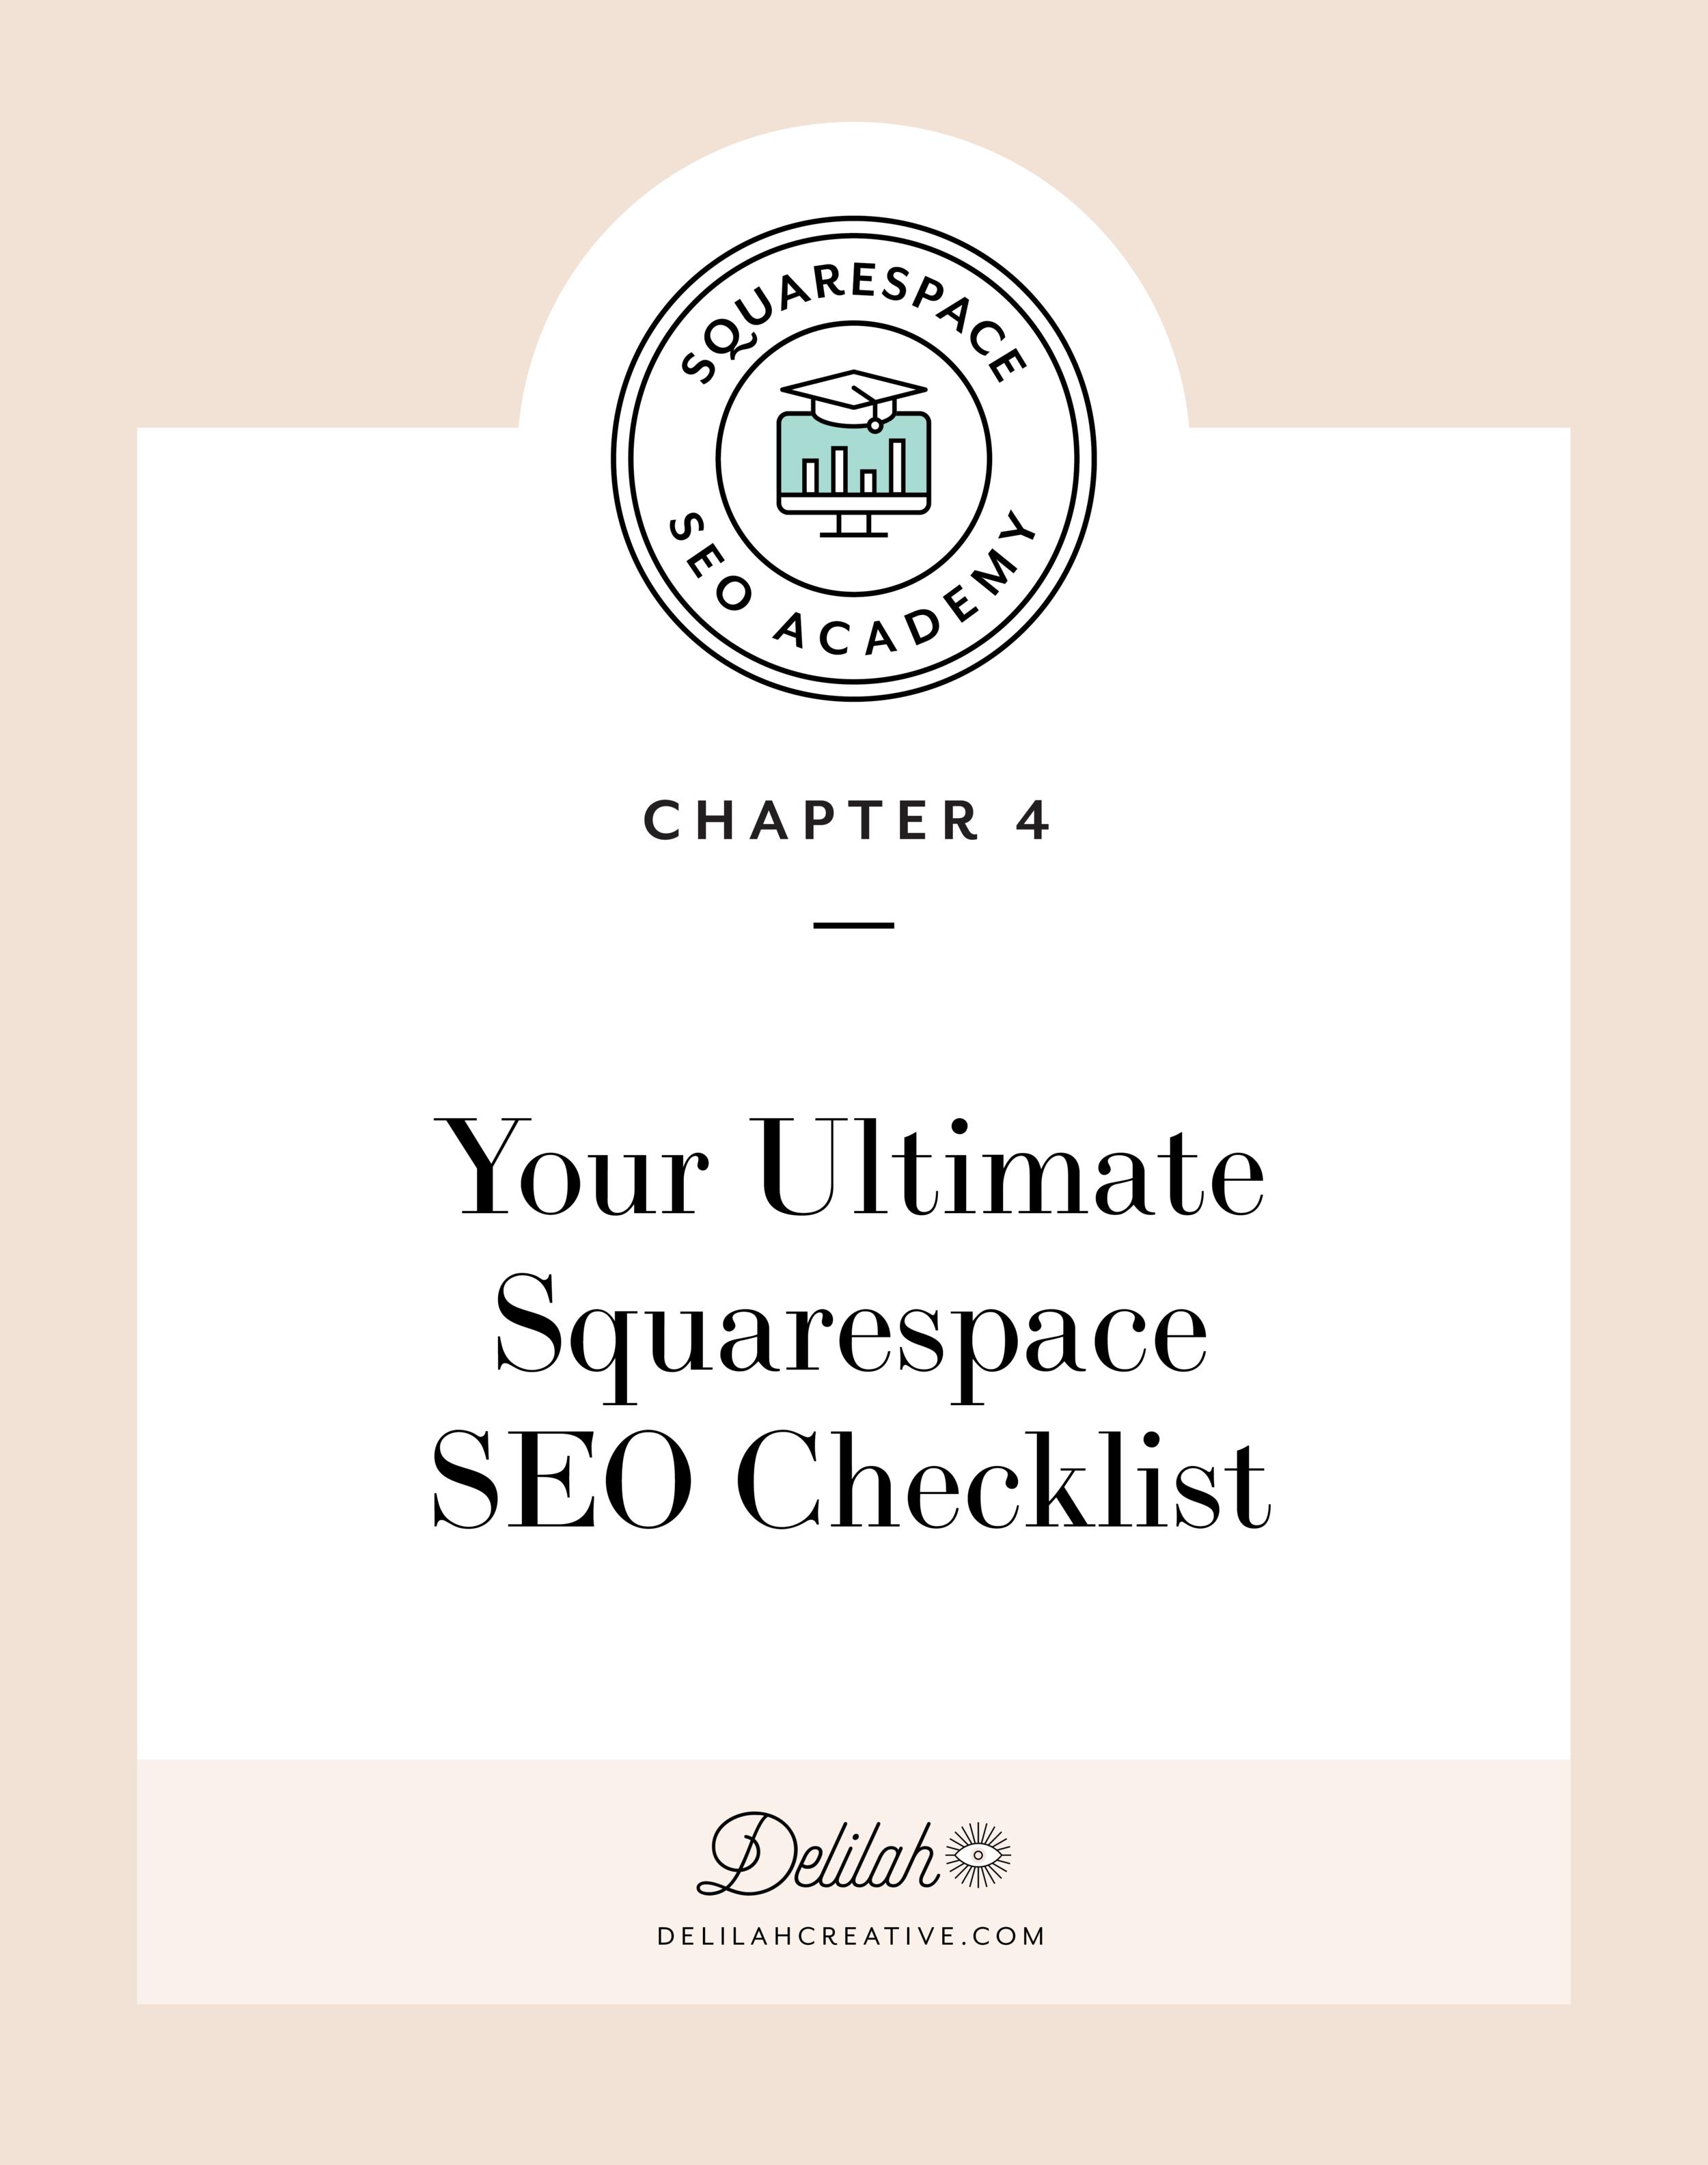 SEO Academy_Squarespace-SEO-Checklist - 2-07.png